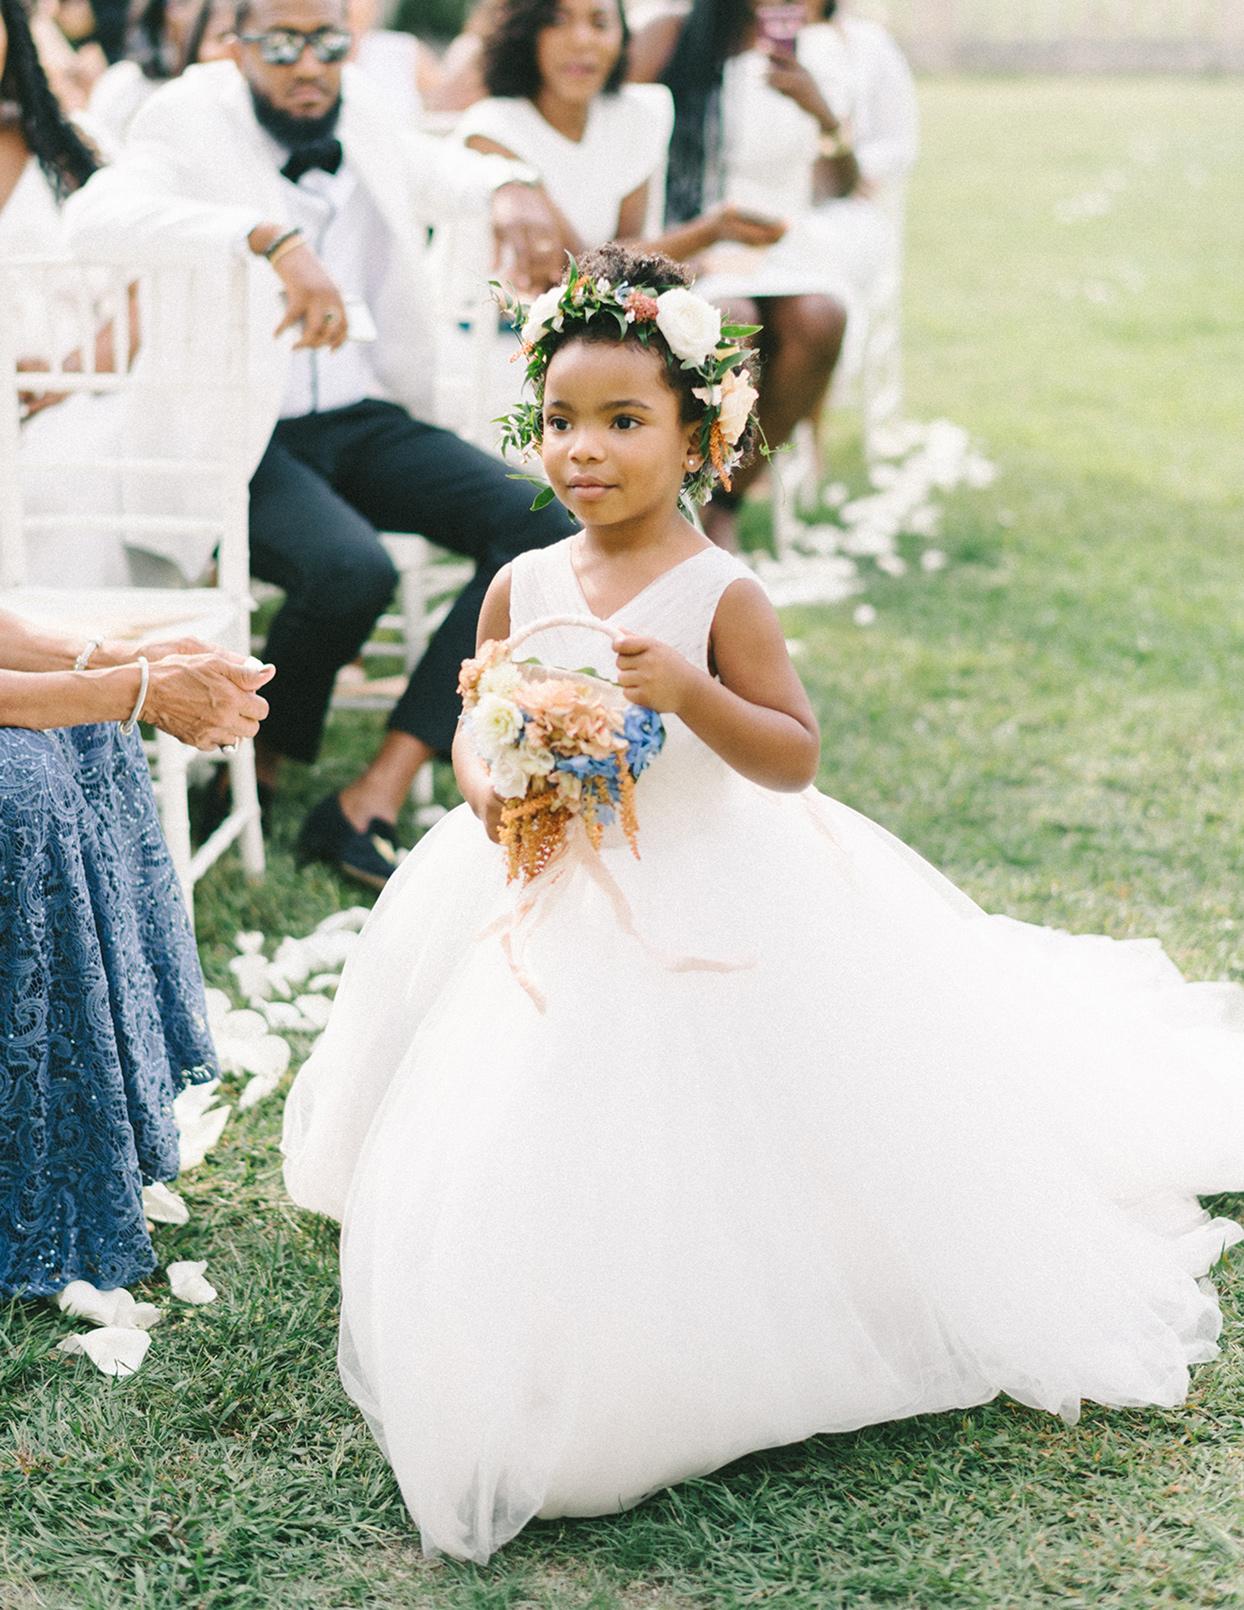 ericka meechaeyl wedding flower girl walking down aisle